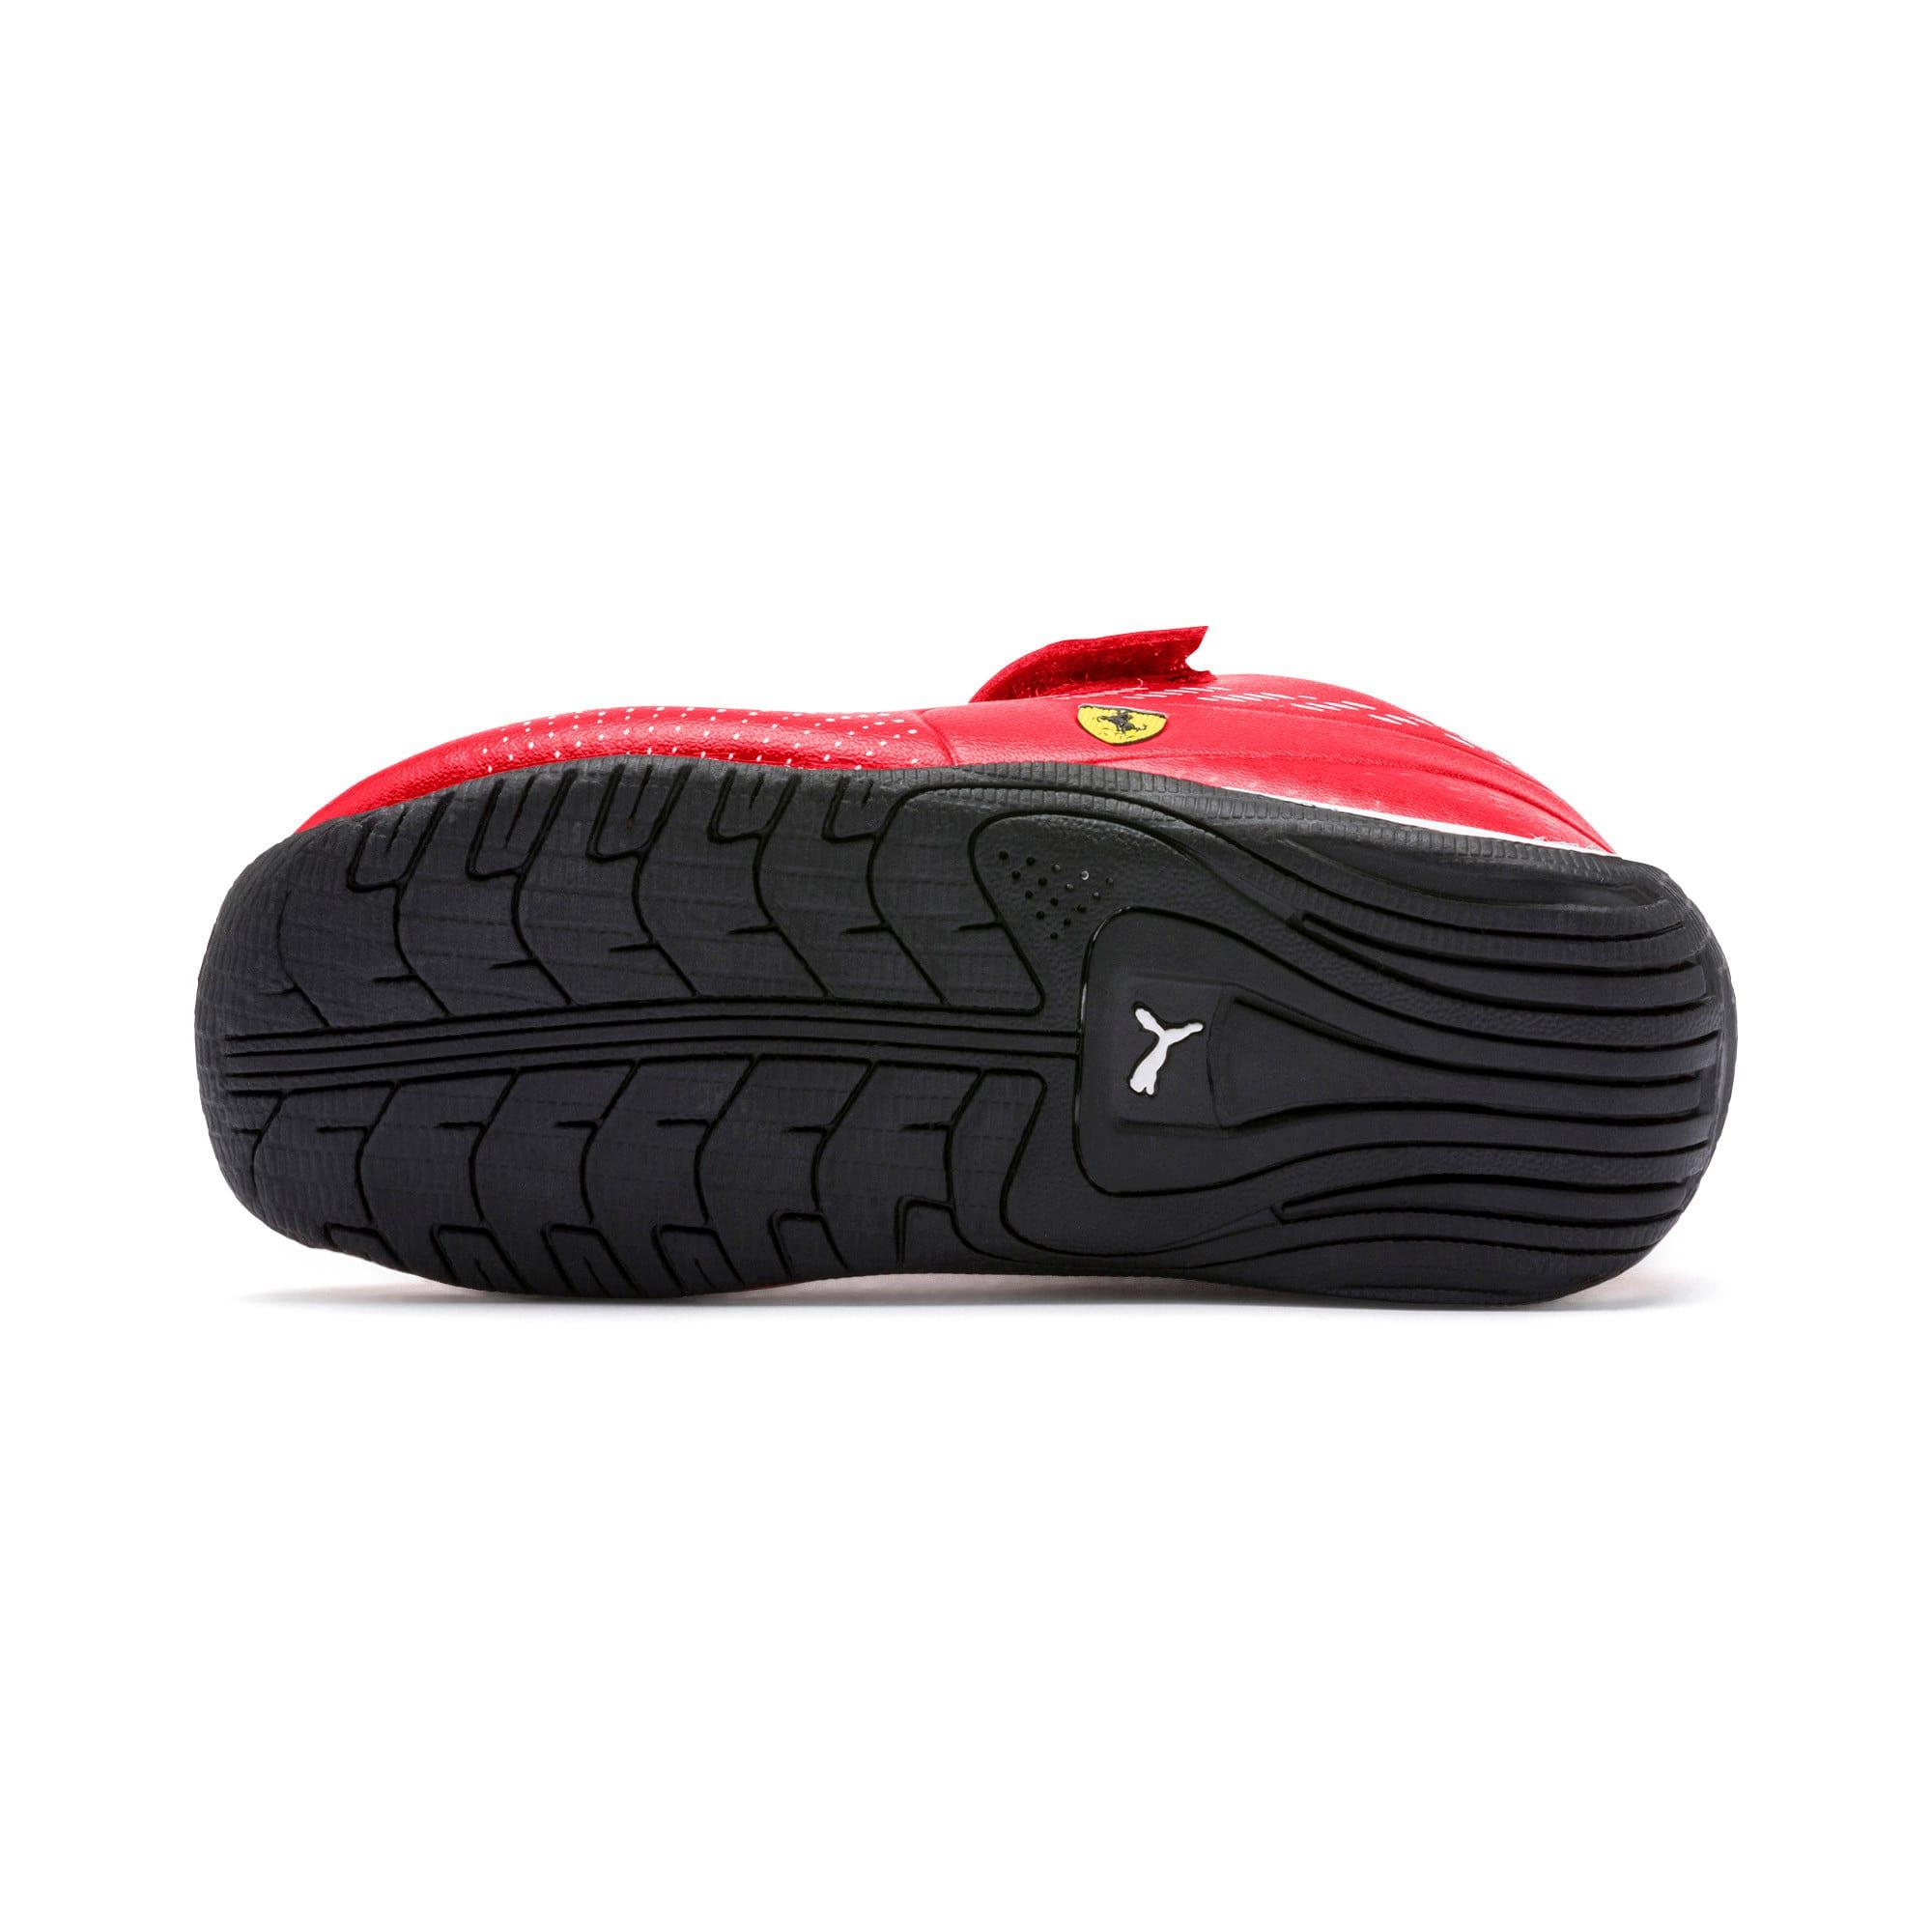 Thumbnail 3 of Scuderia Ferrari Drift Cat 5 Ultra II Toddler Shoes, Rosso Corsa-Puma White, medium